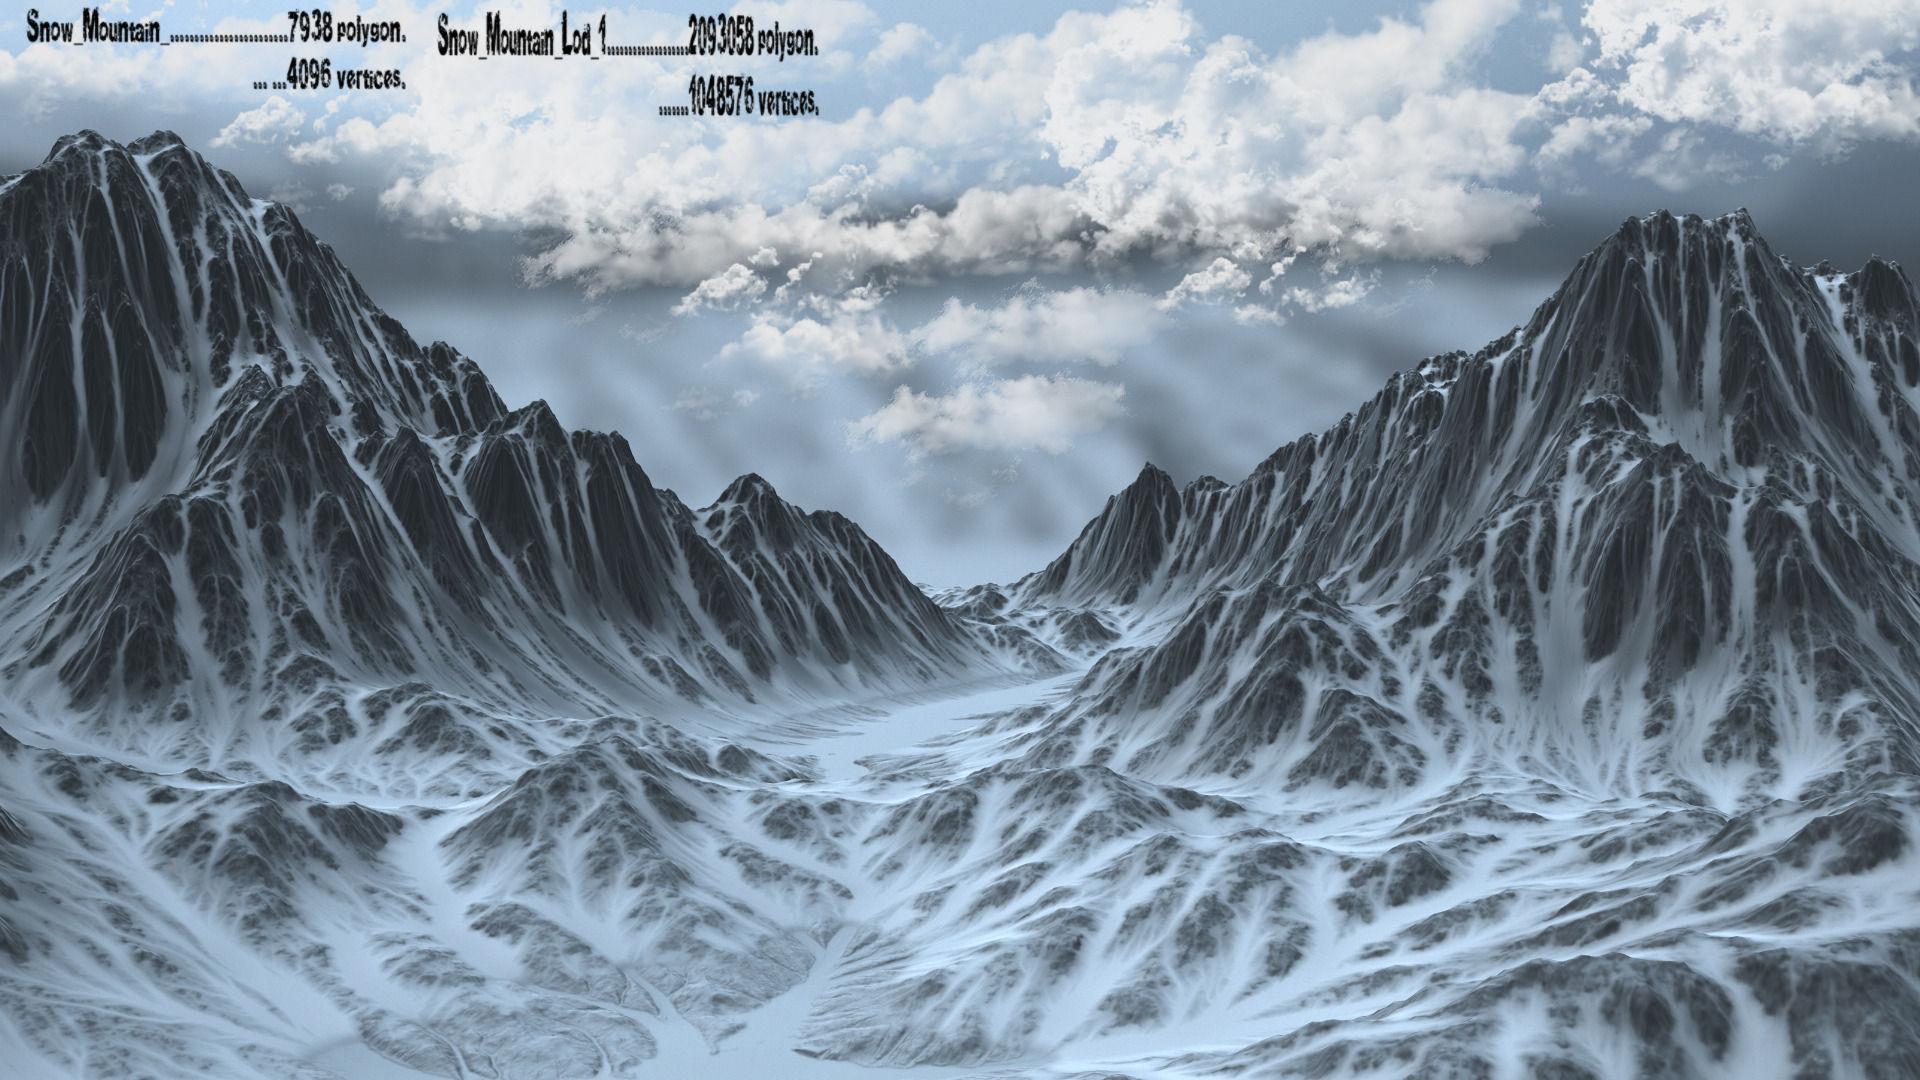 snow mountain 3d model | cgtrader